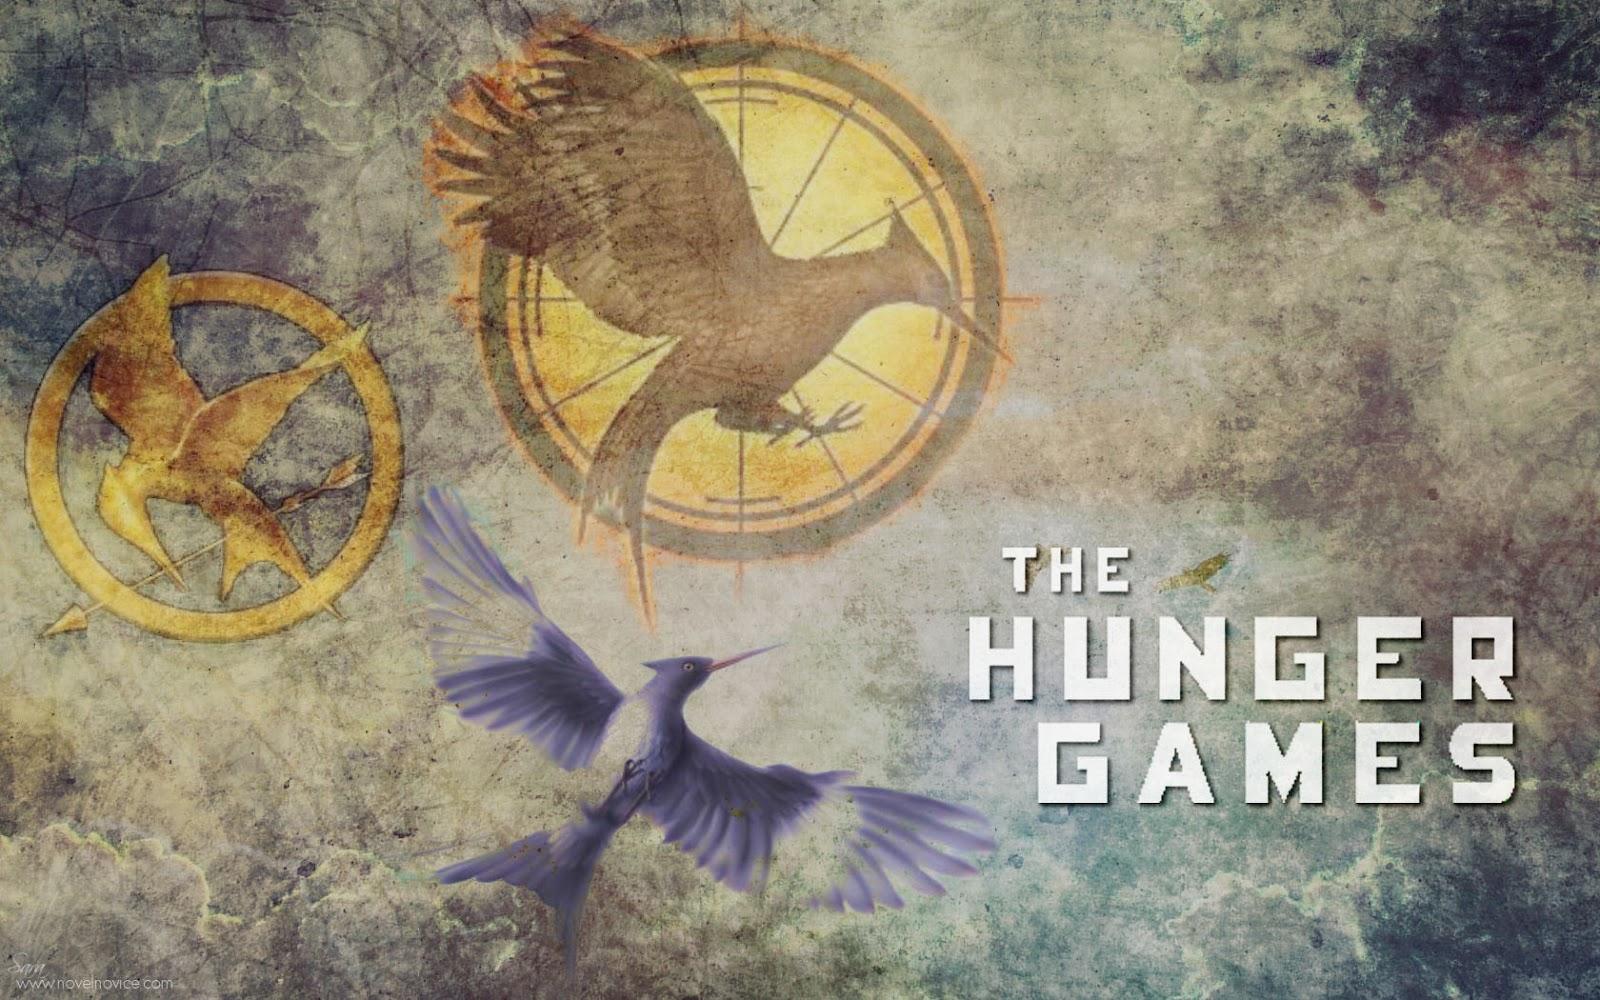 Killzone Shadow Fall Iphone 5 Wallpaper Wallpapers Hd Los Juegos Del Hambre The Hunger Games